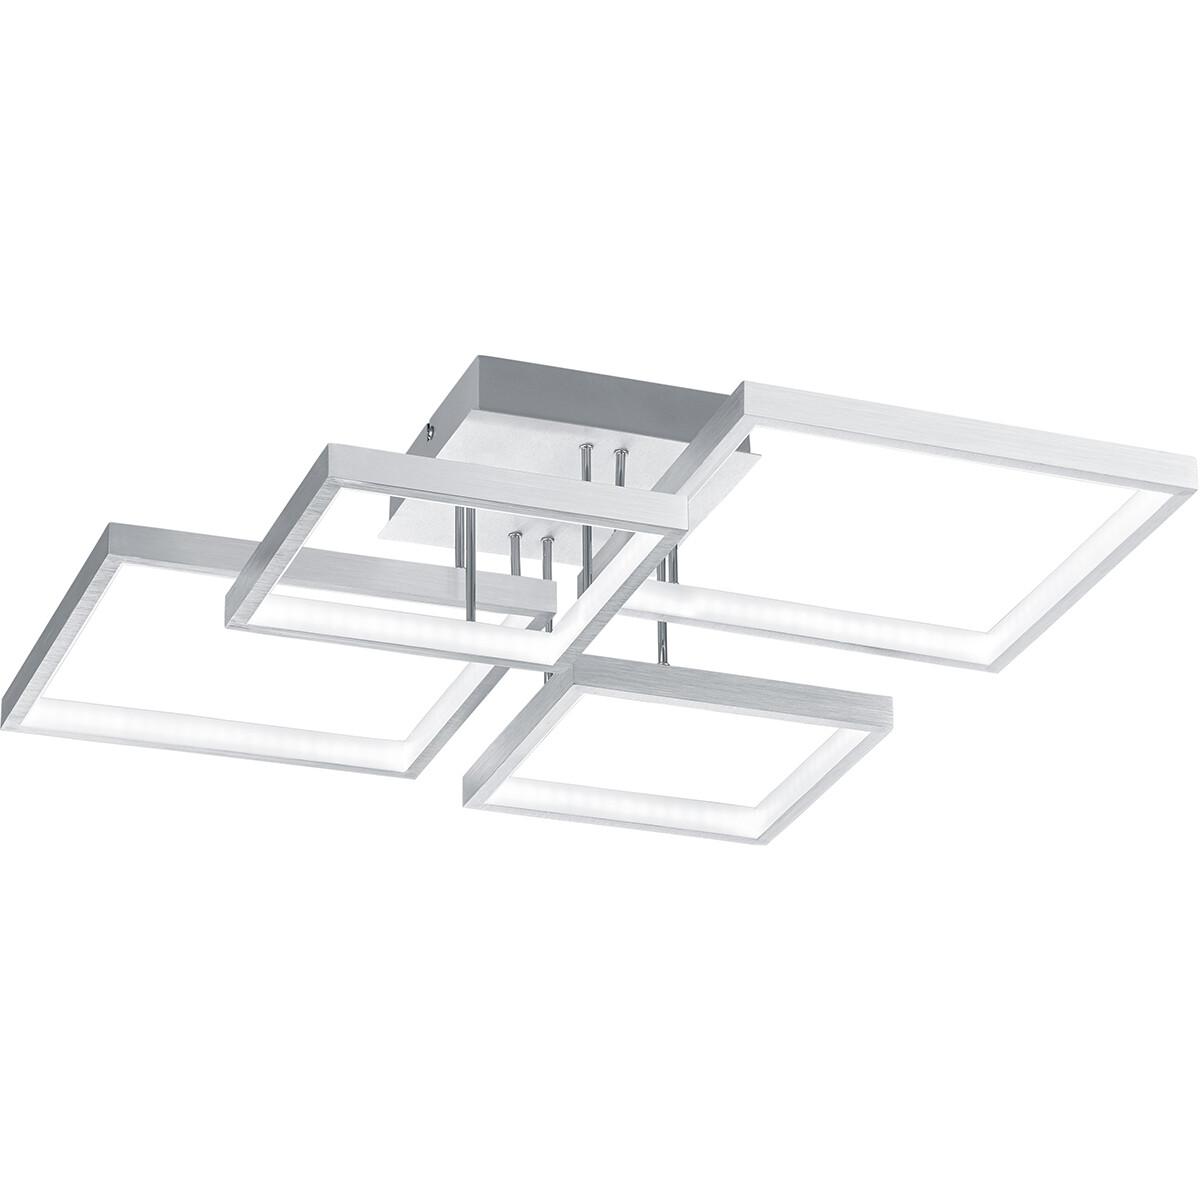 LED Plafondlamp - Plafondverlichting - Trion Soranto - 24W - Warm Wit 3000K - Dimbaar - Vierkant - M